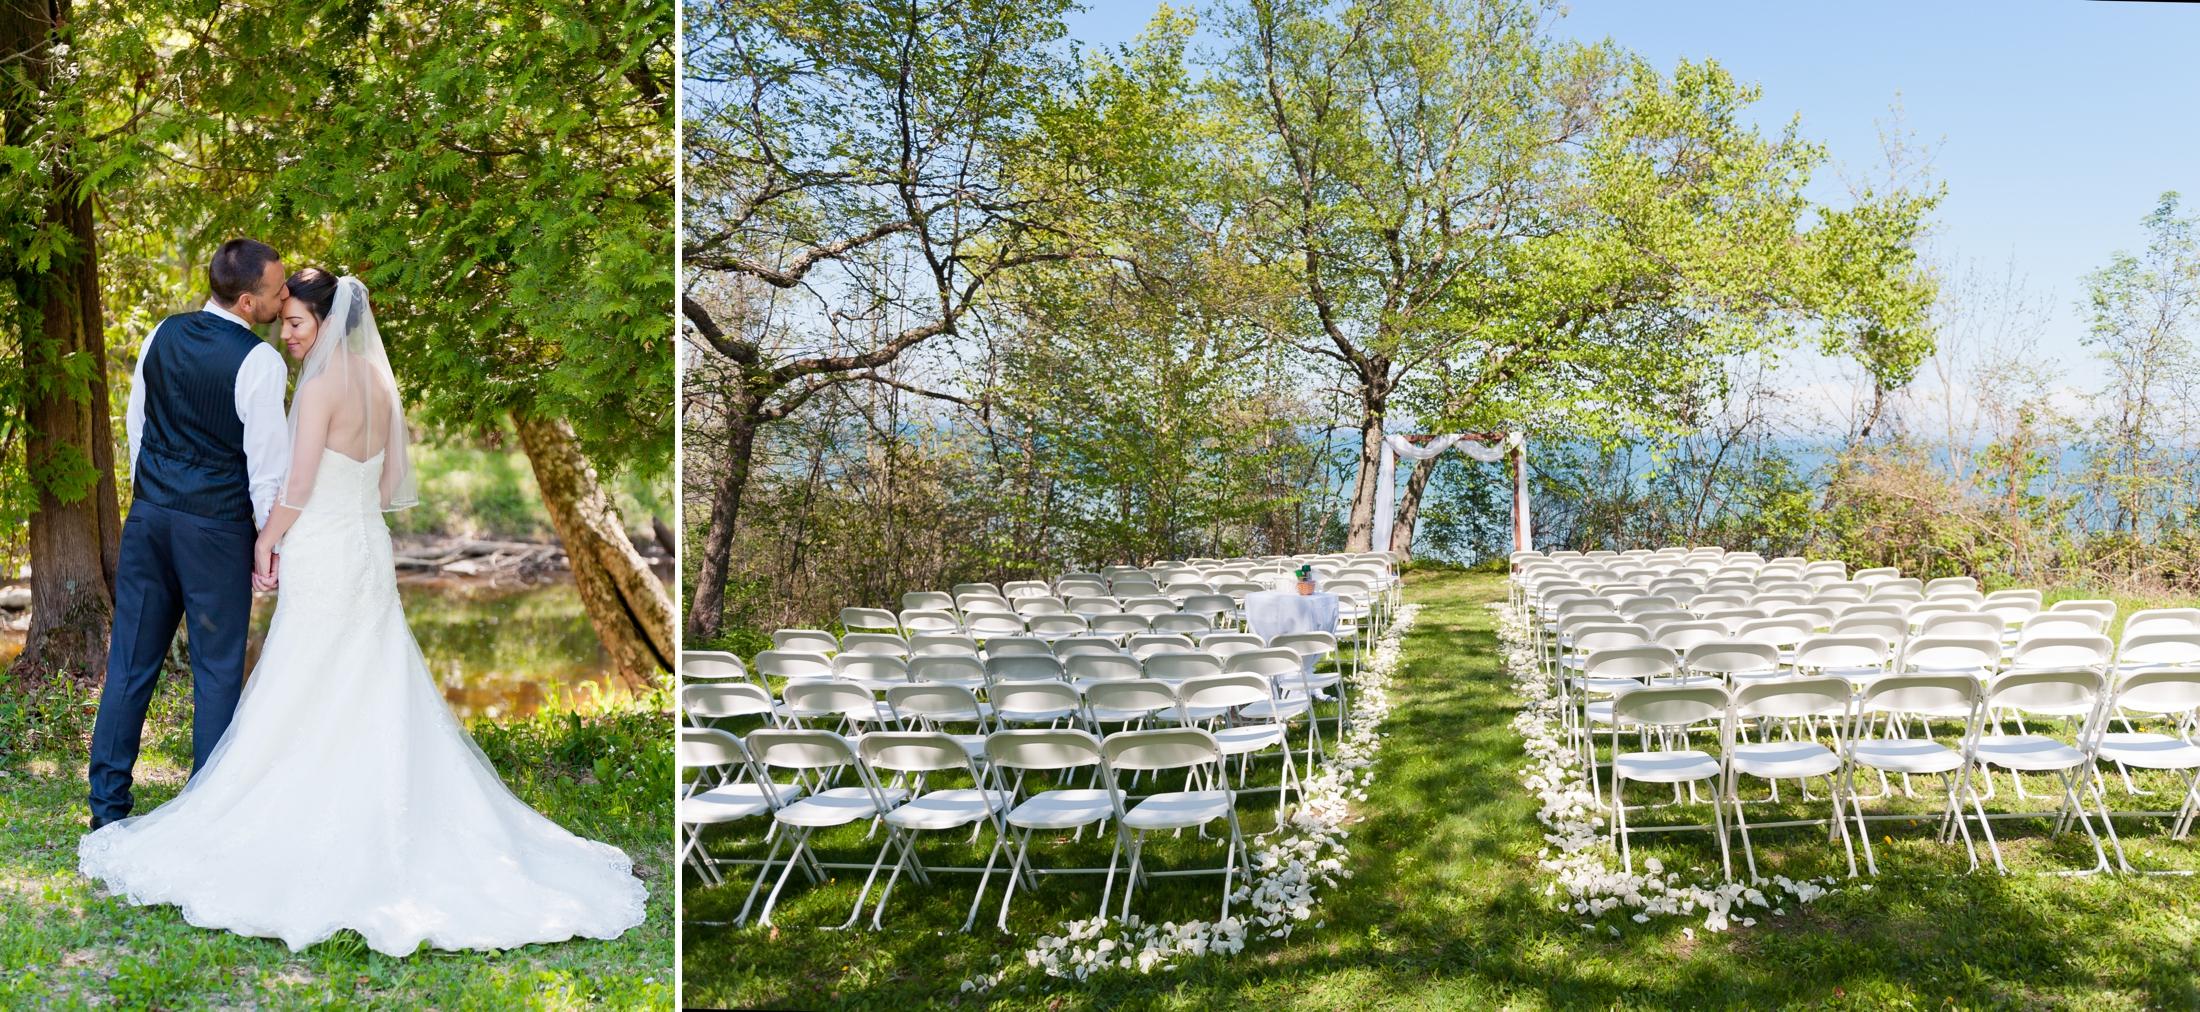 Best Green Bay Wedding Photographer, Silver Creek Park, Manitowoc Wisconsin